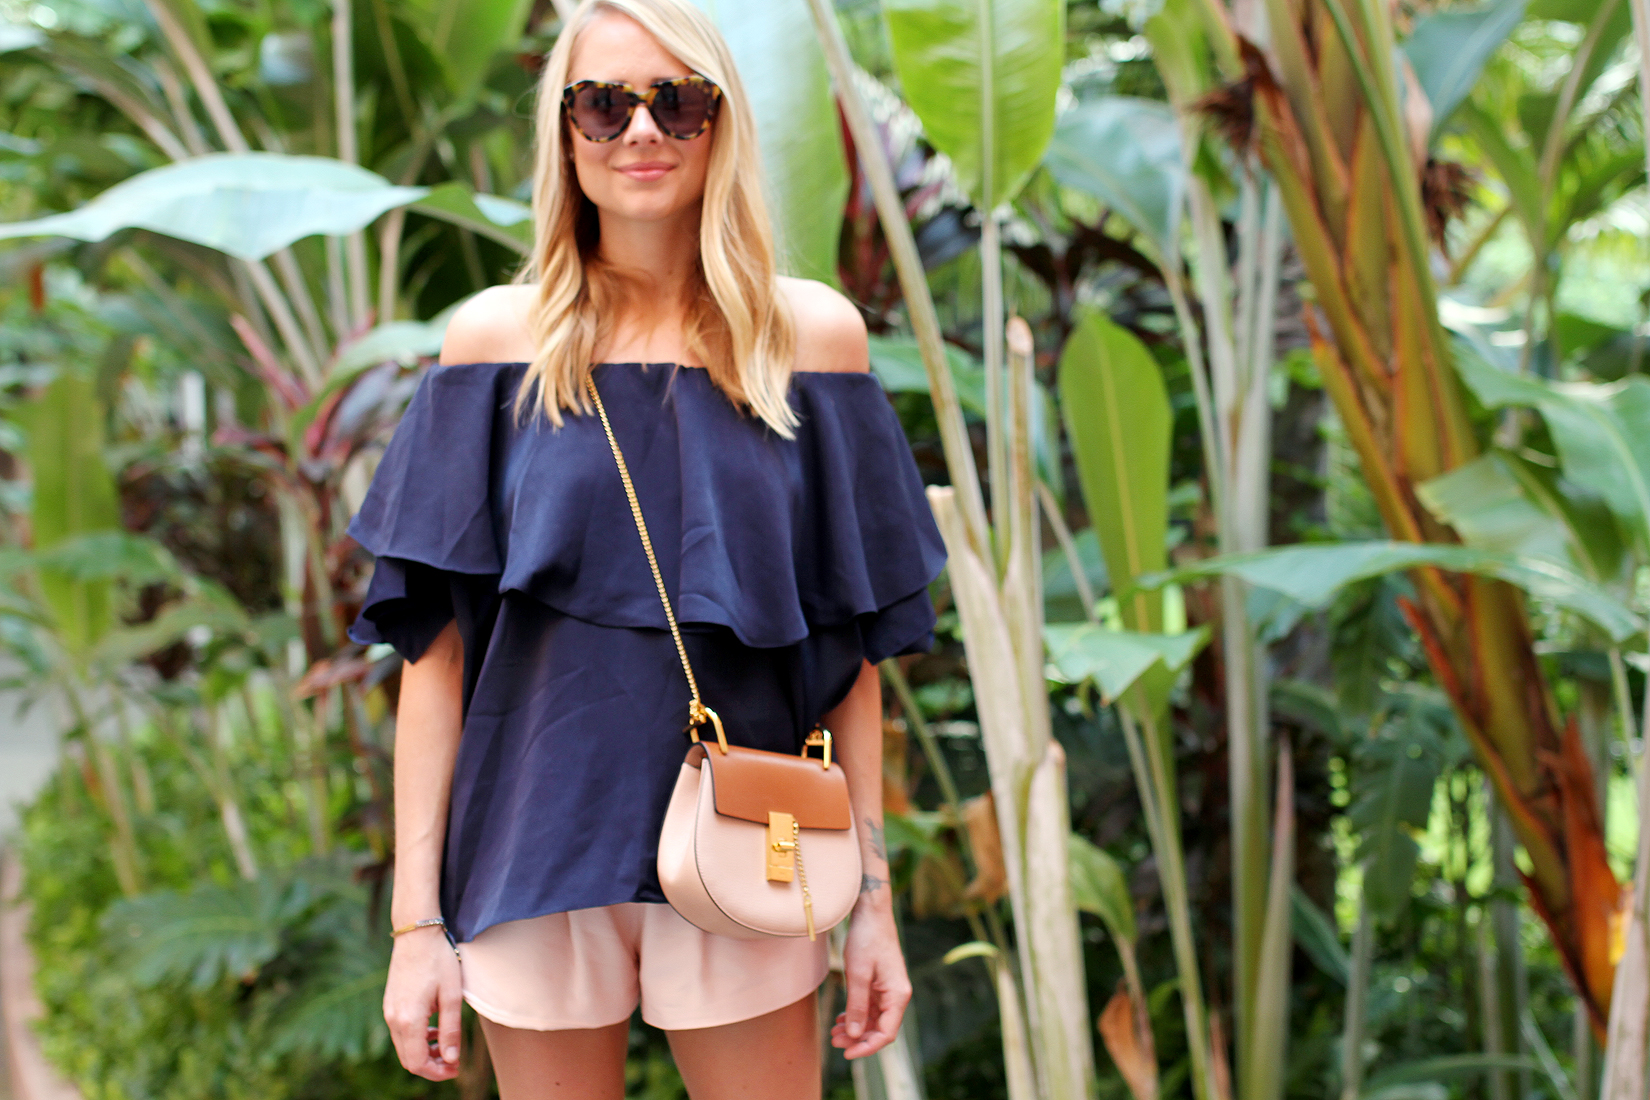 fashion-jackson-chloe-drew-handbag-mlm-label-maison-off-the-shoulder-top